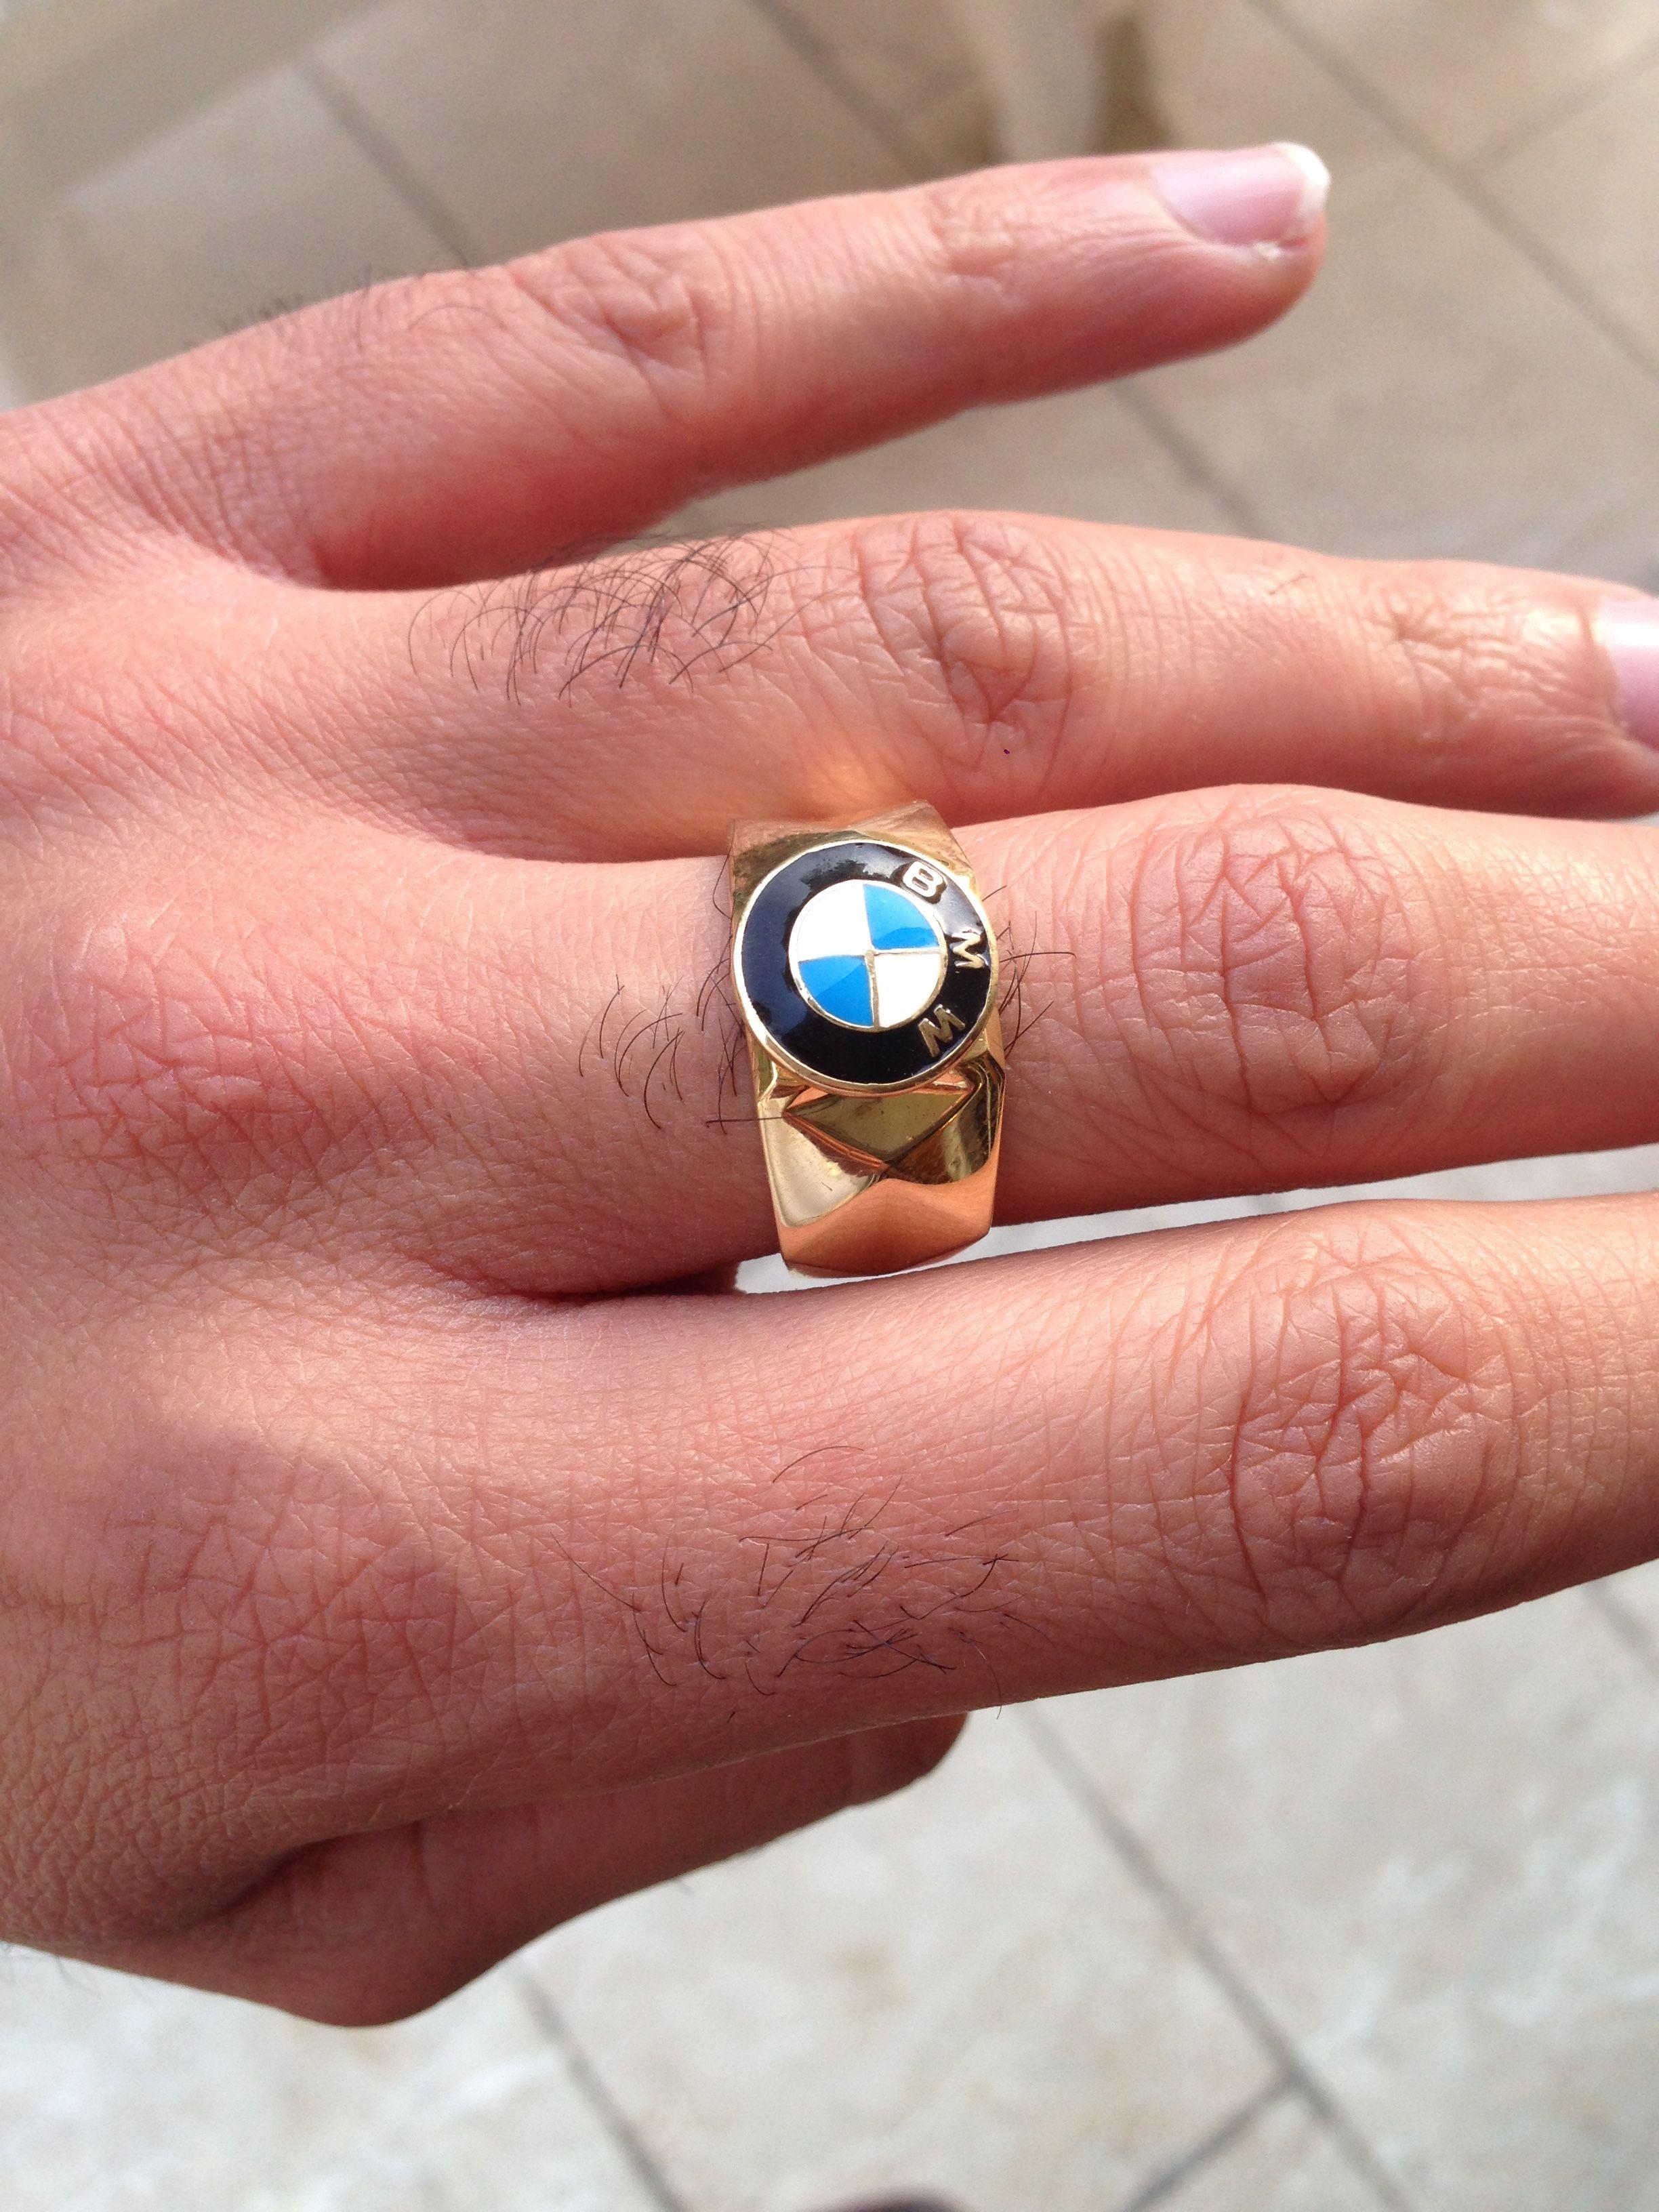 Pin by arash abbasi on BMW ring | Pinterest | BMW